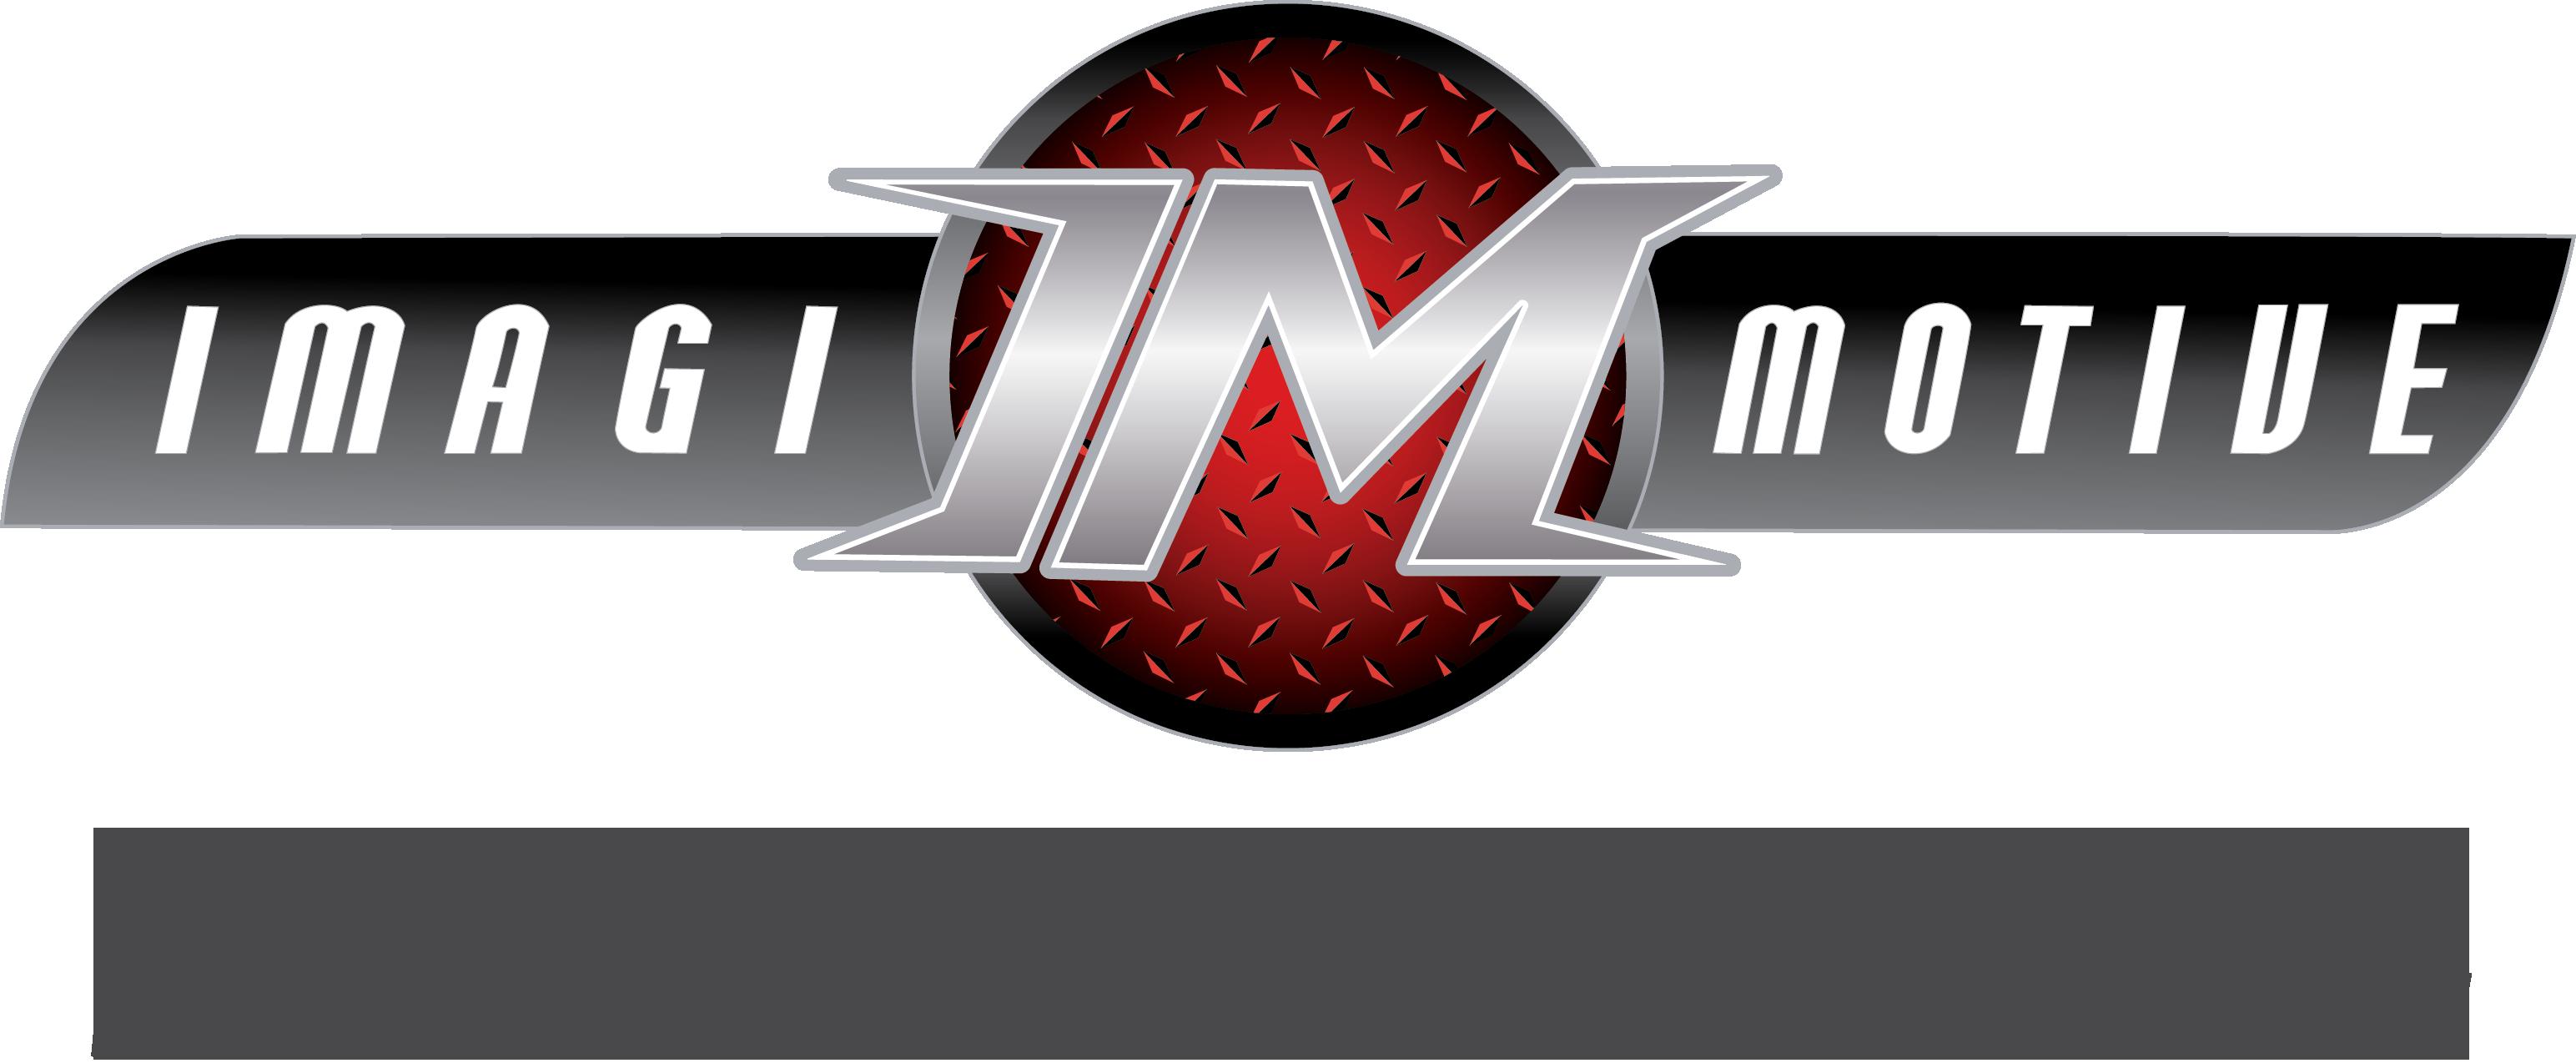 imagimotive logo with slogan